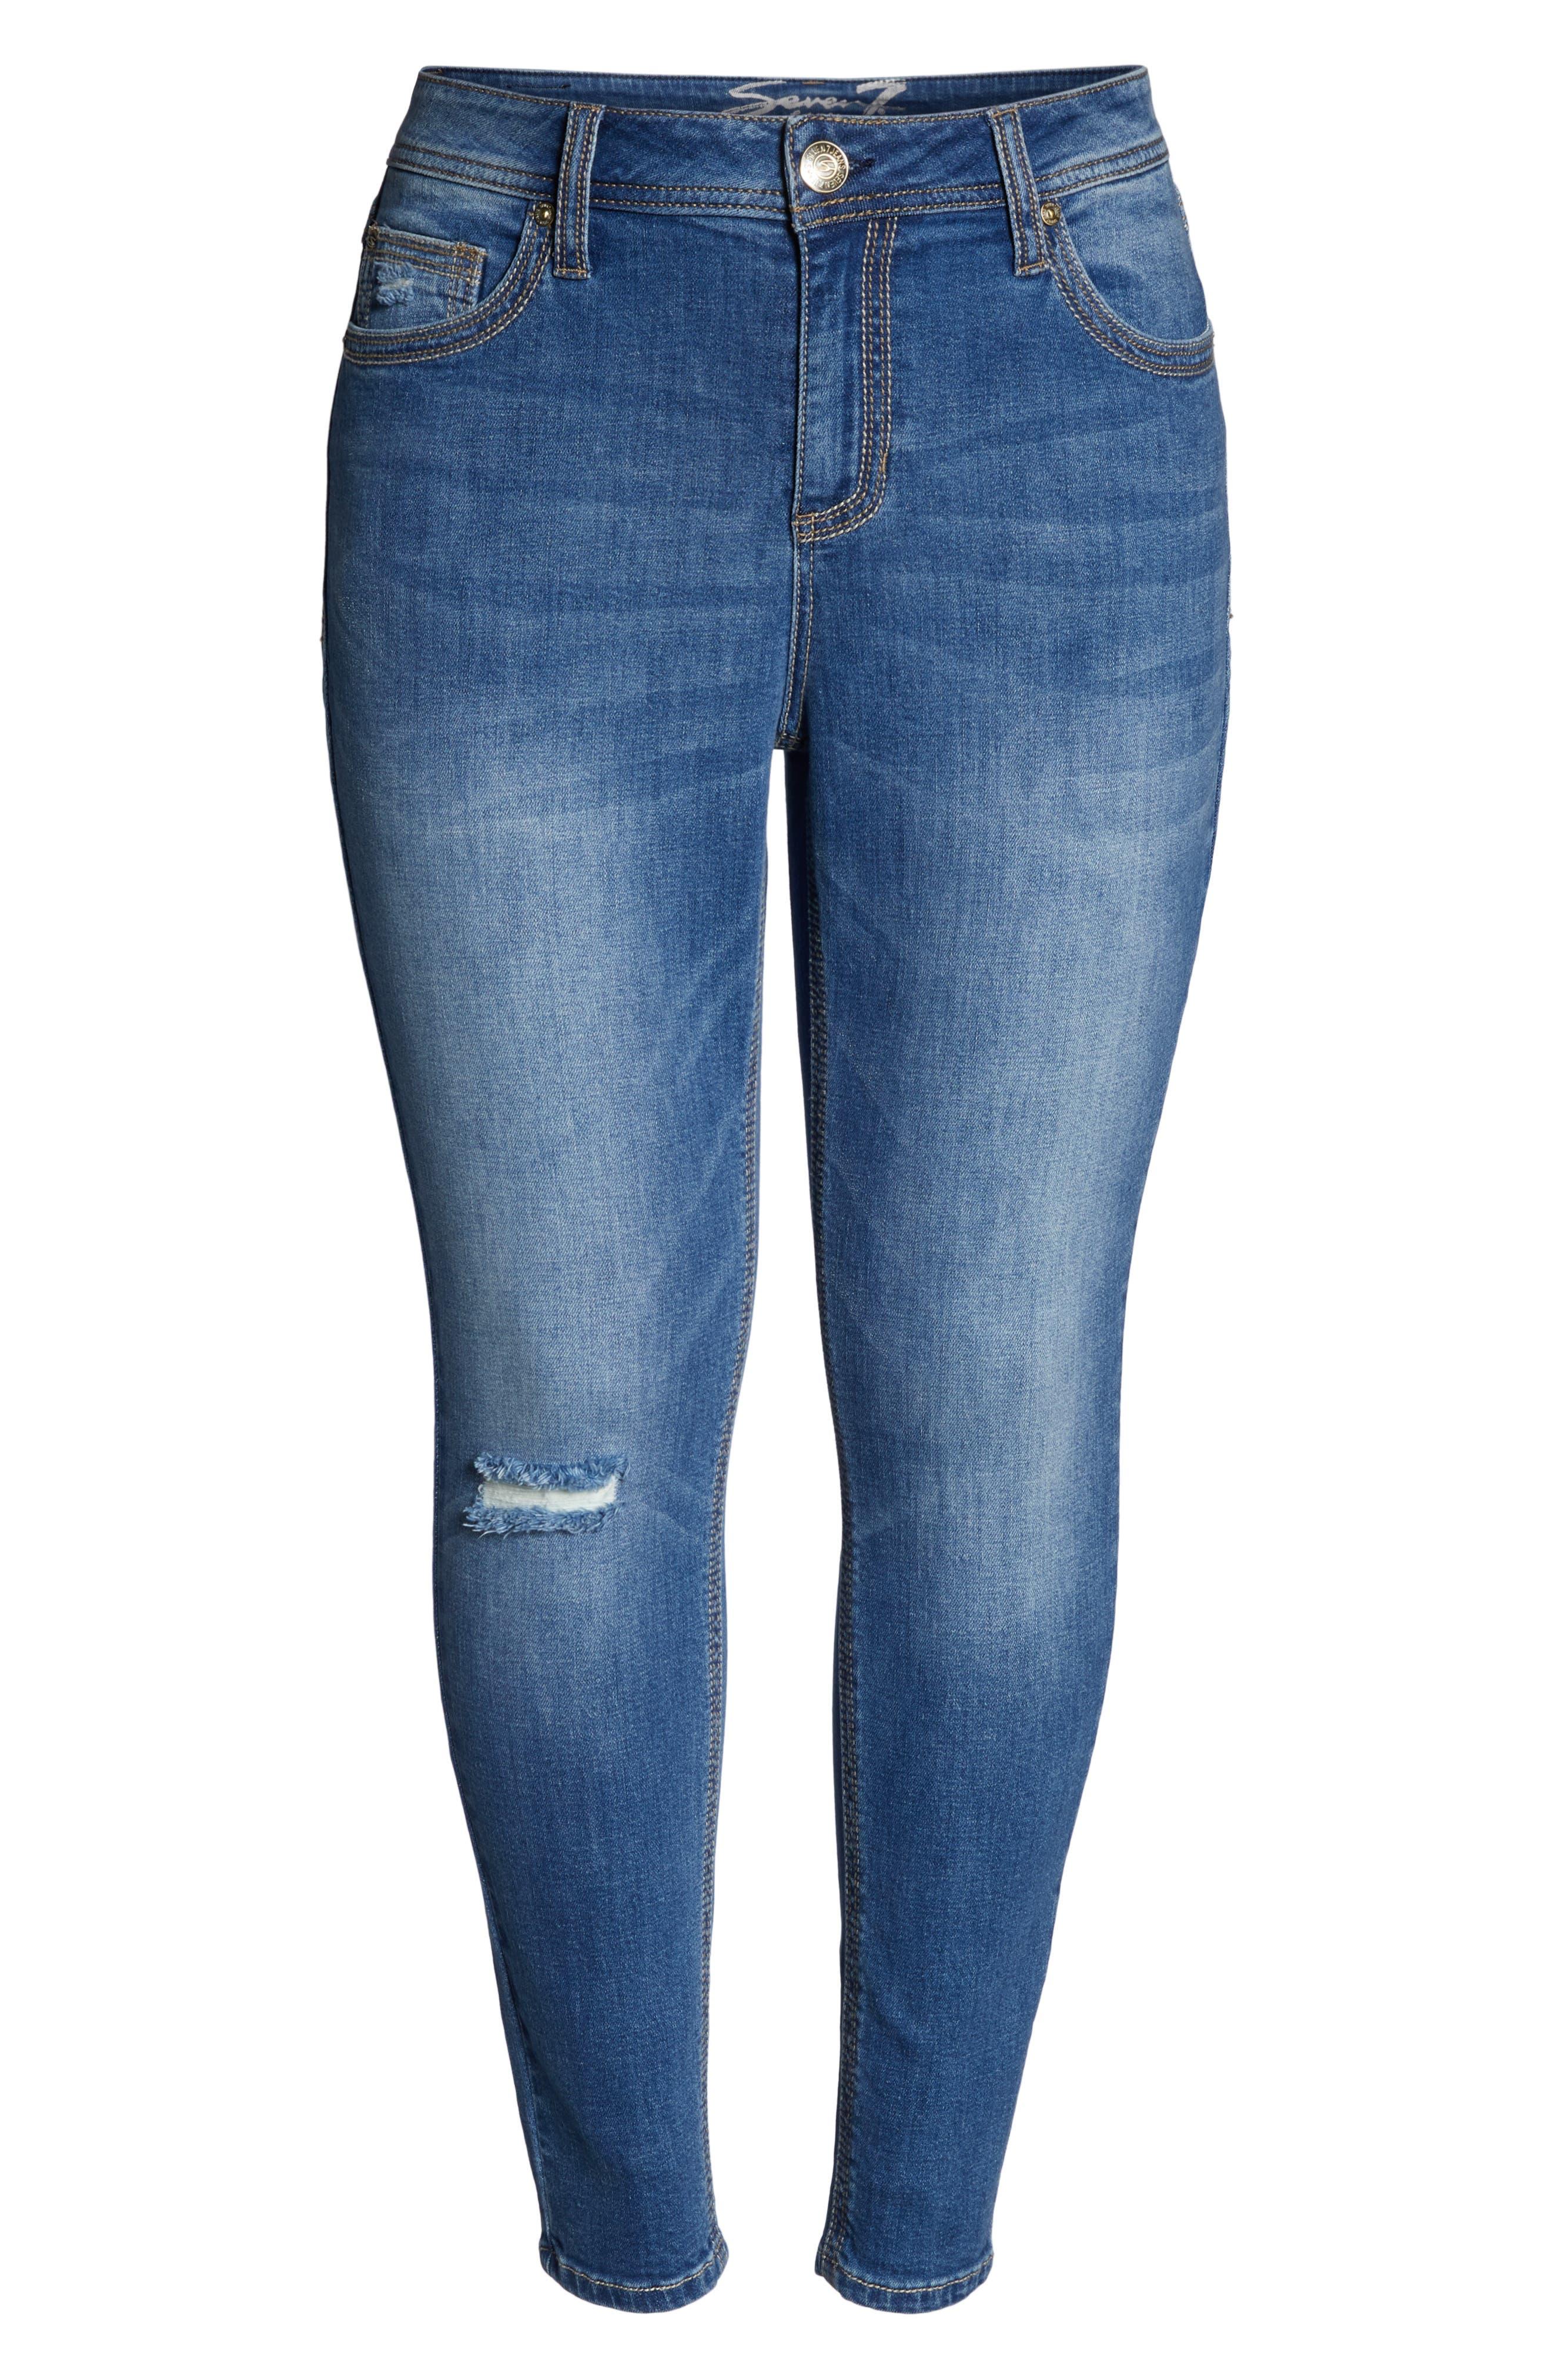 Rocker Skinny Jeans,                             Alternate thumbnail 7, color,                             LADYBIRD